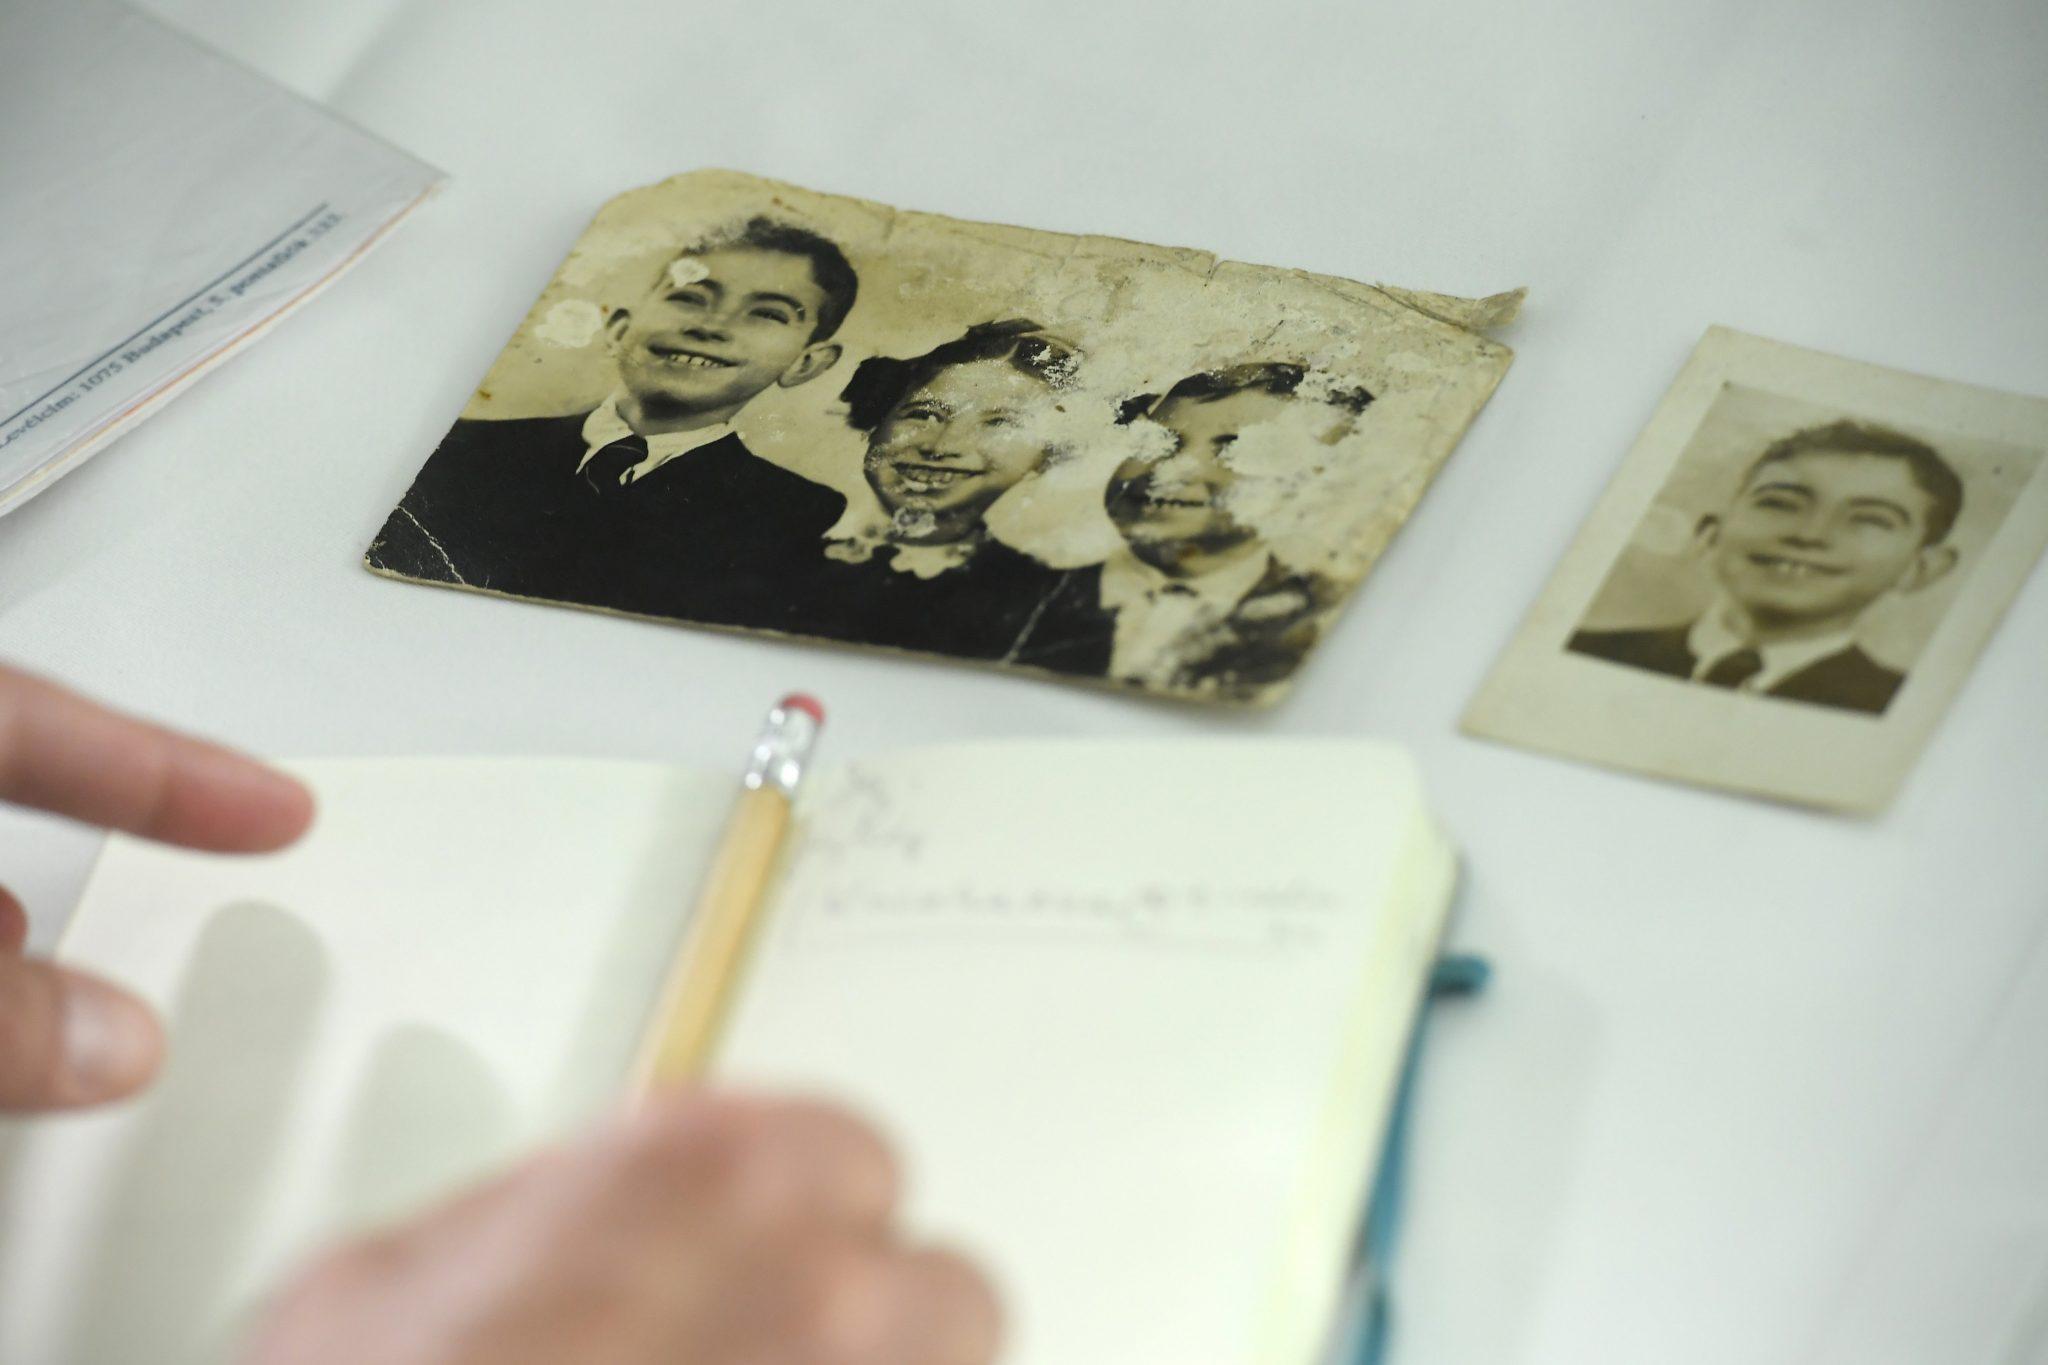 child victims of Holocaust